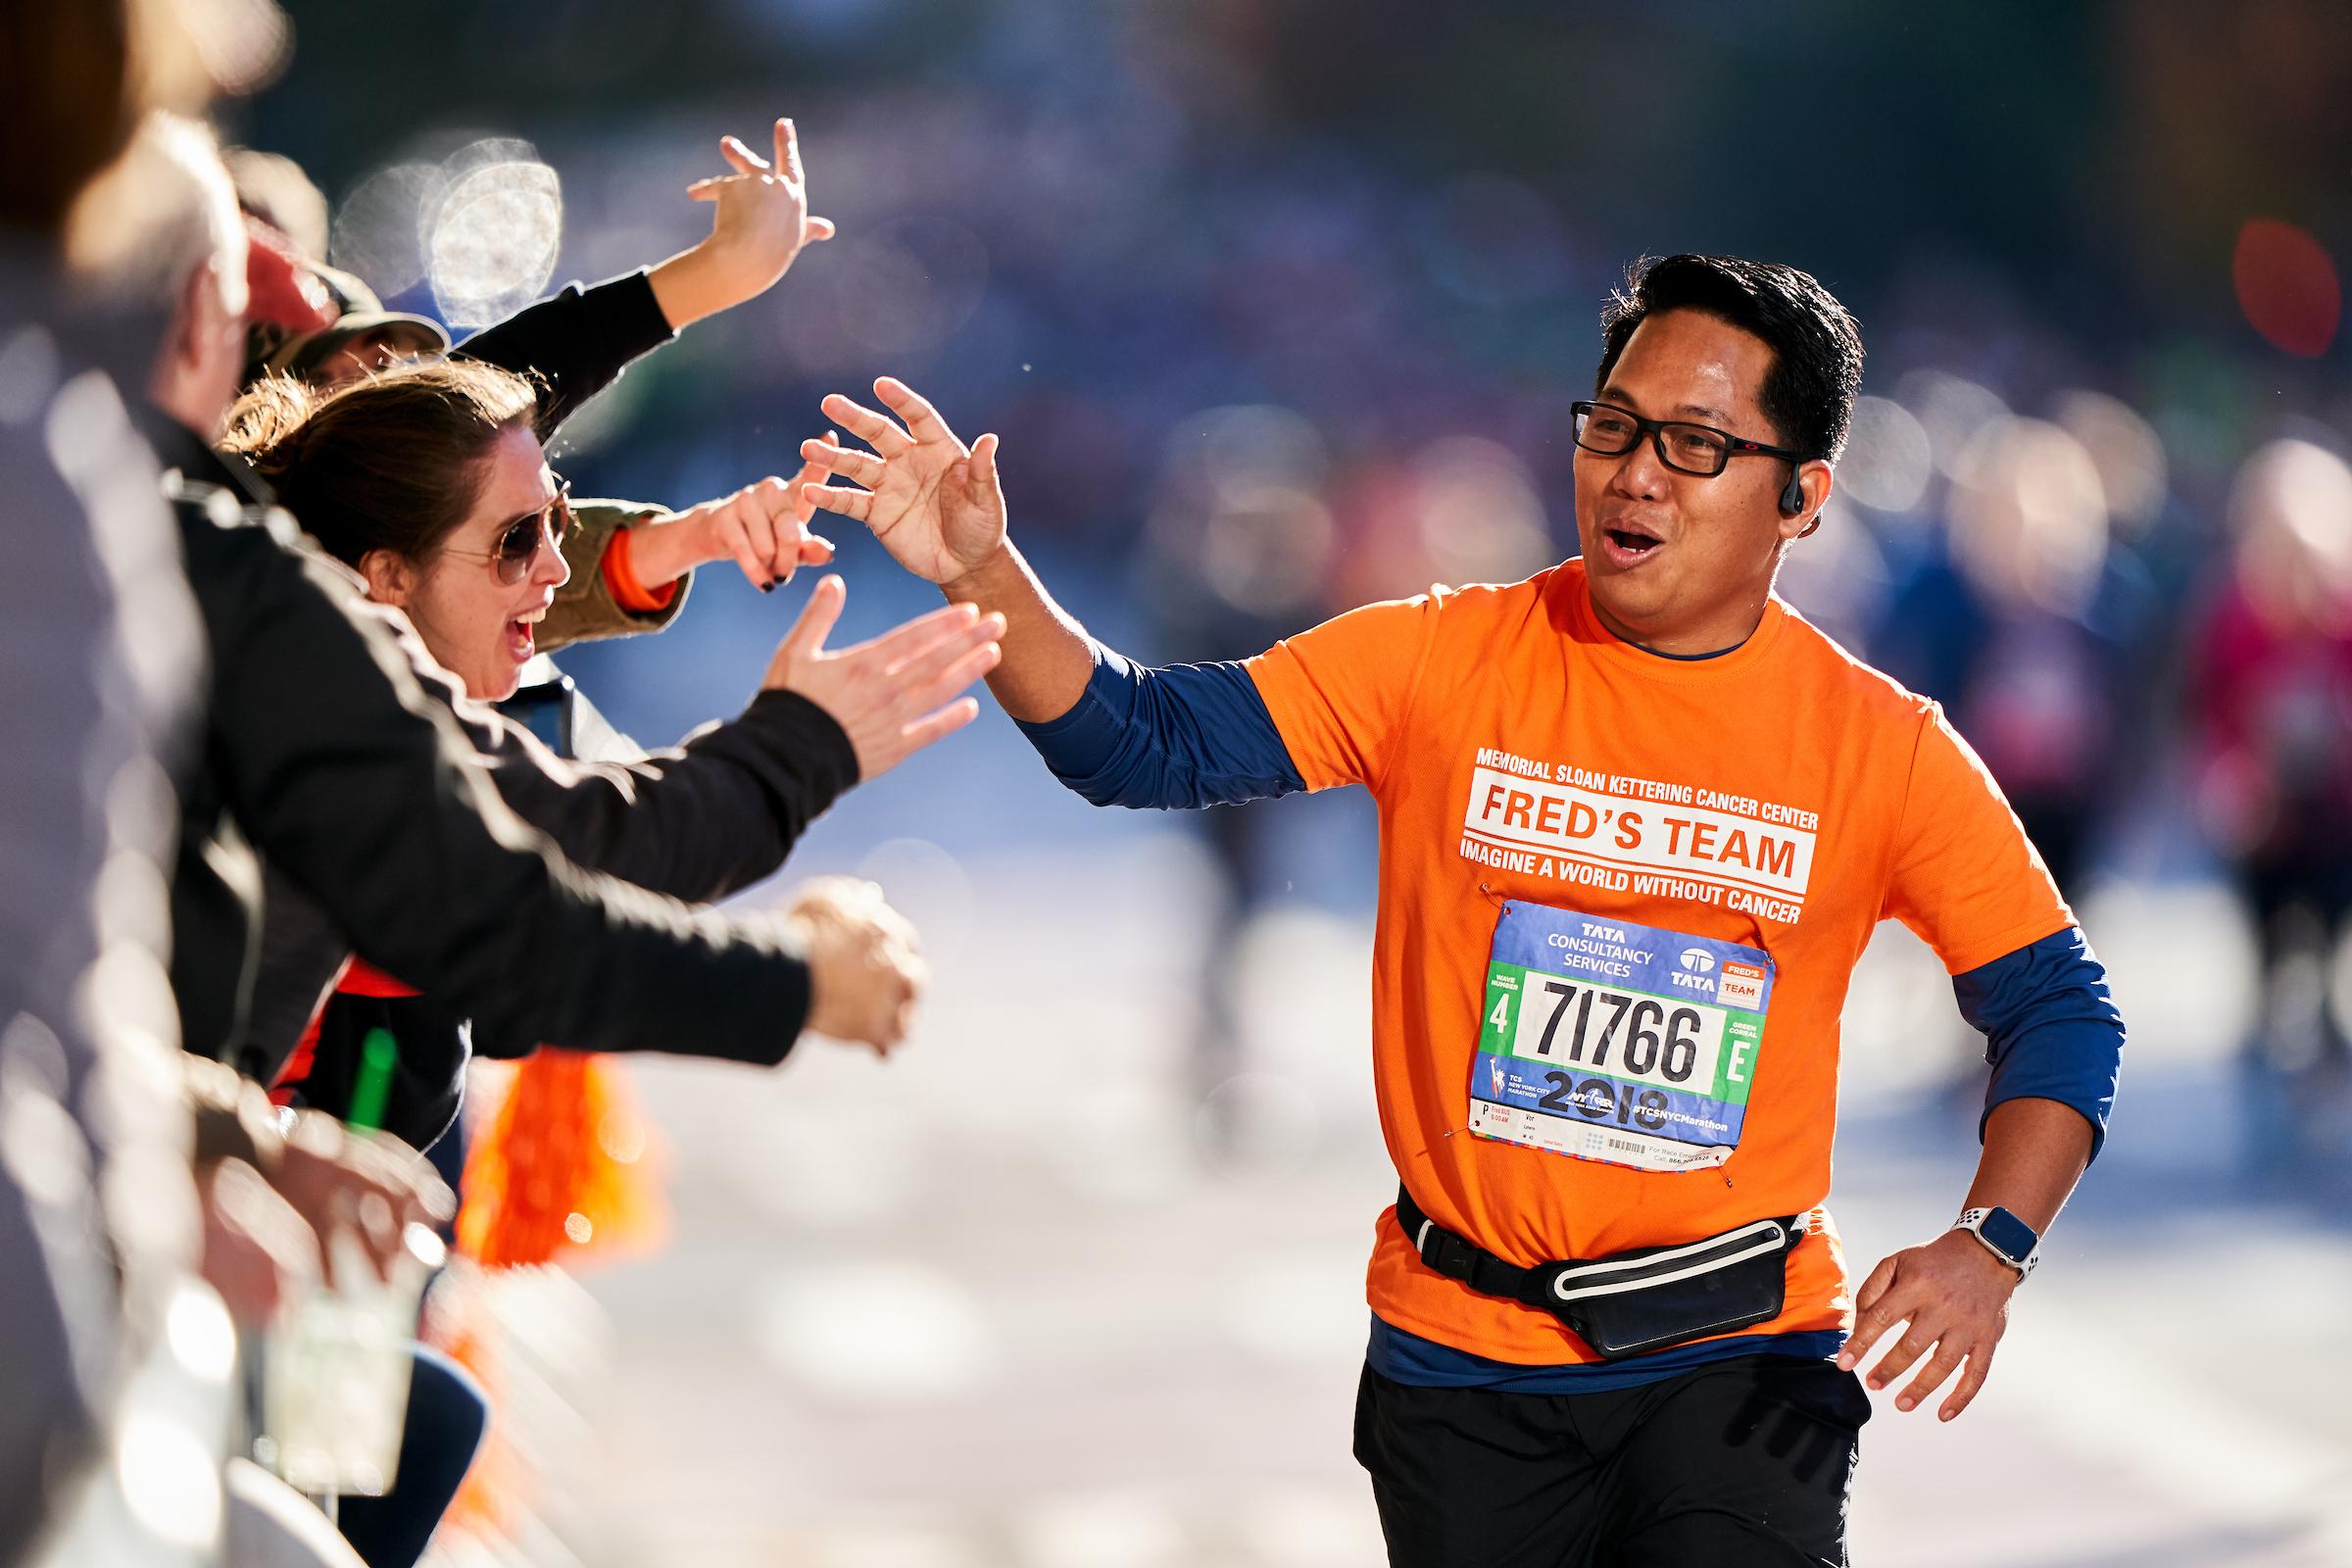 2018 New York City Marathon, New York, New York for Memorial Sloan Kettering Cancer Center.  Sony A9, Sony 400mm f2.8 GM-OSS